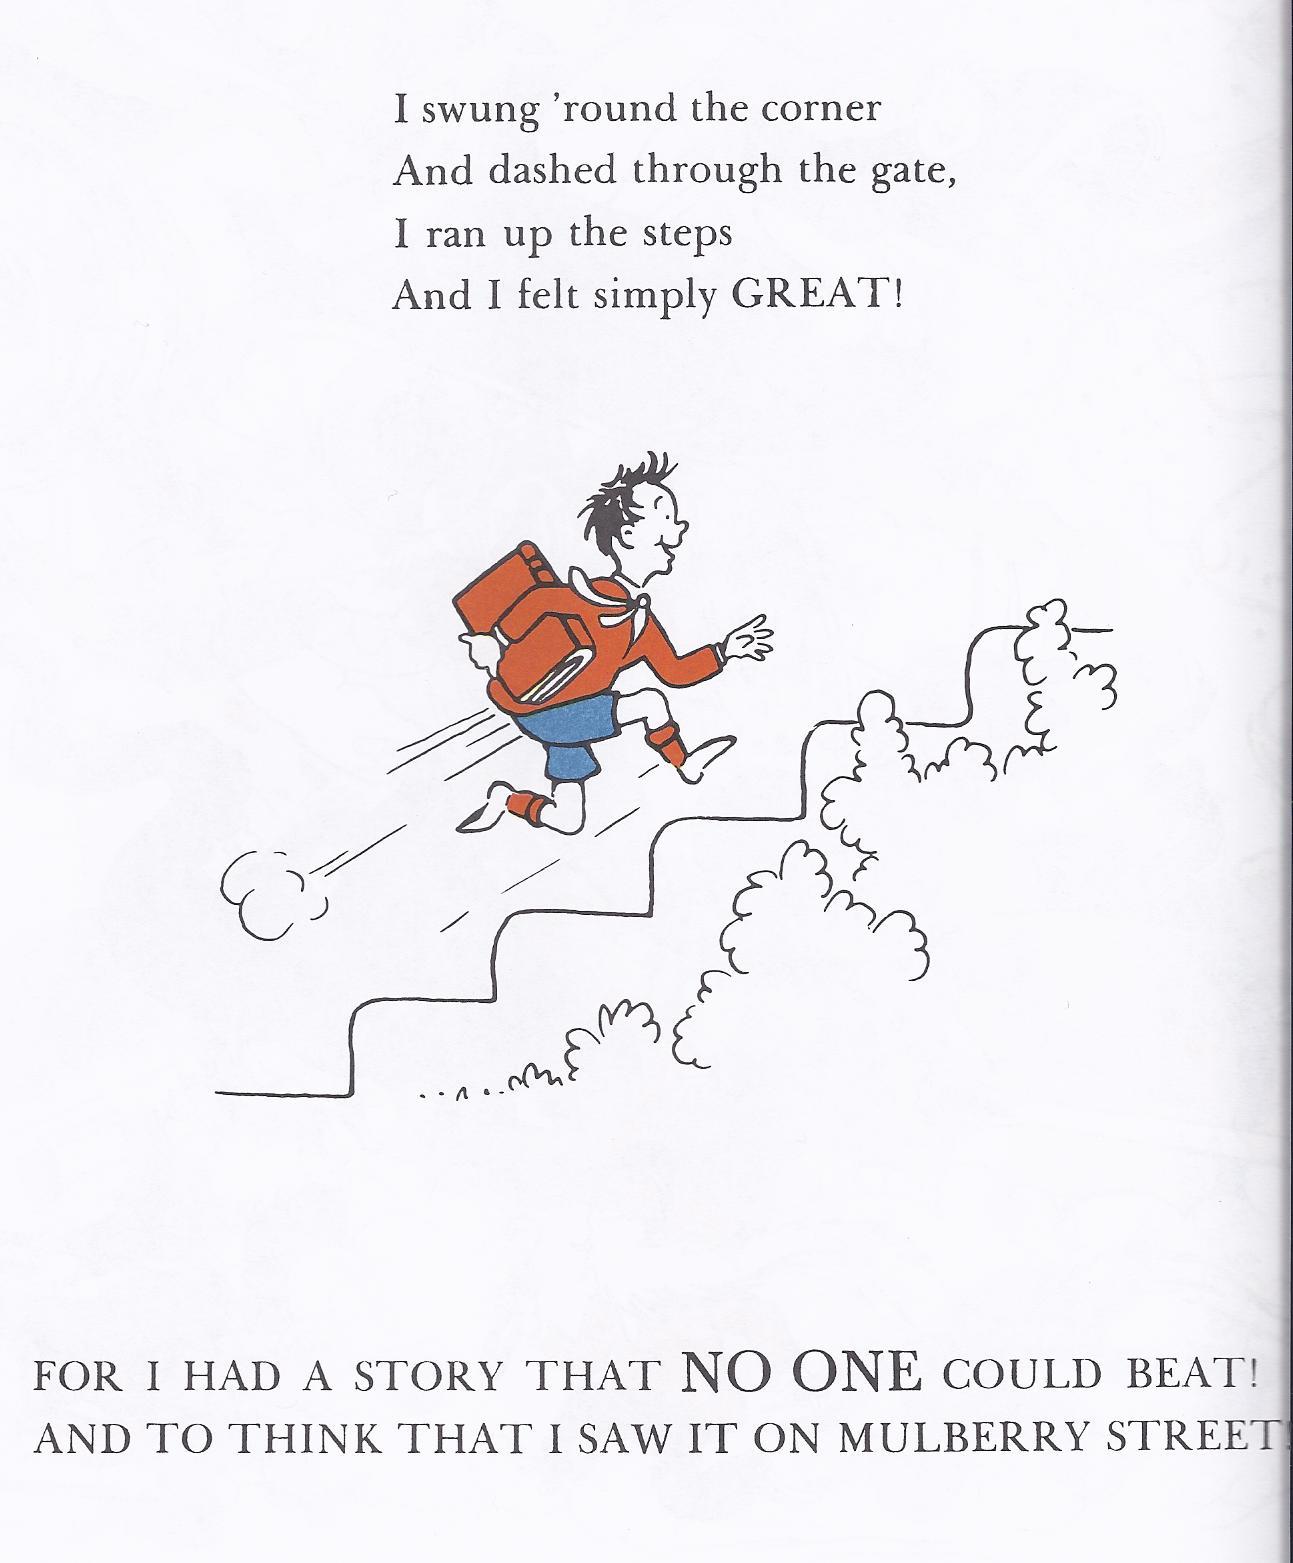 Dr Seuss Quotes About Friendship Seuss And Serendipity…  Sharon Abra Hanen